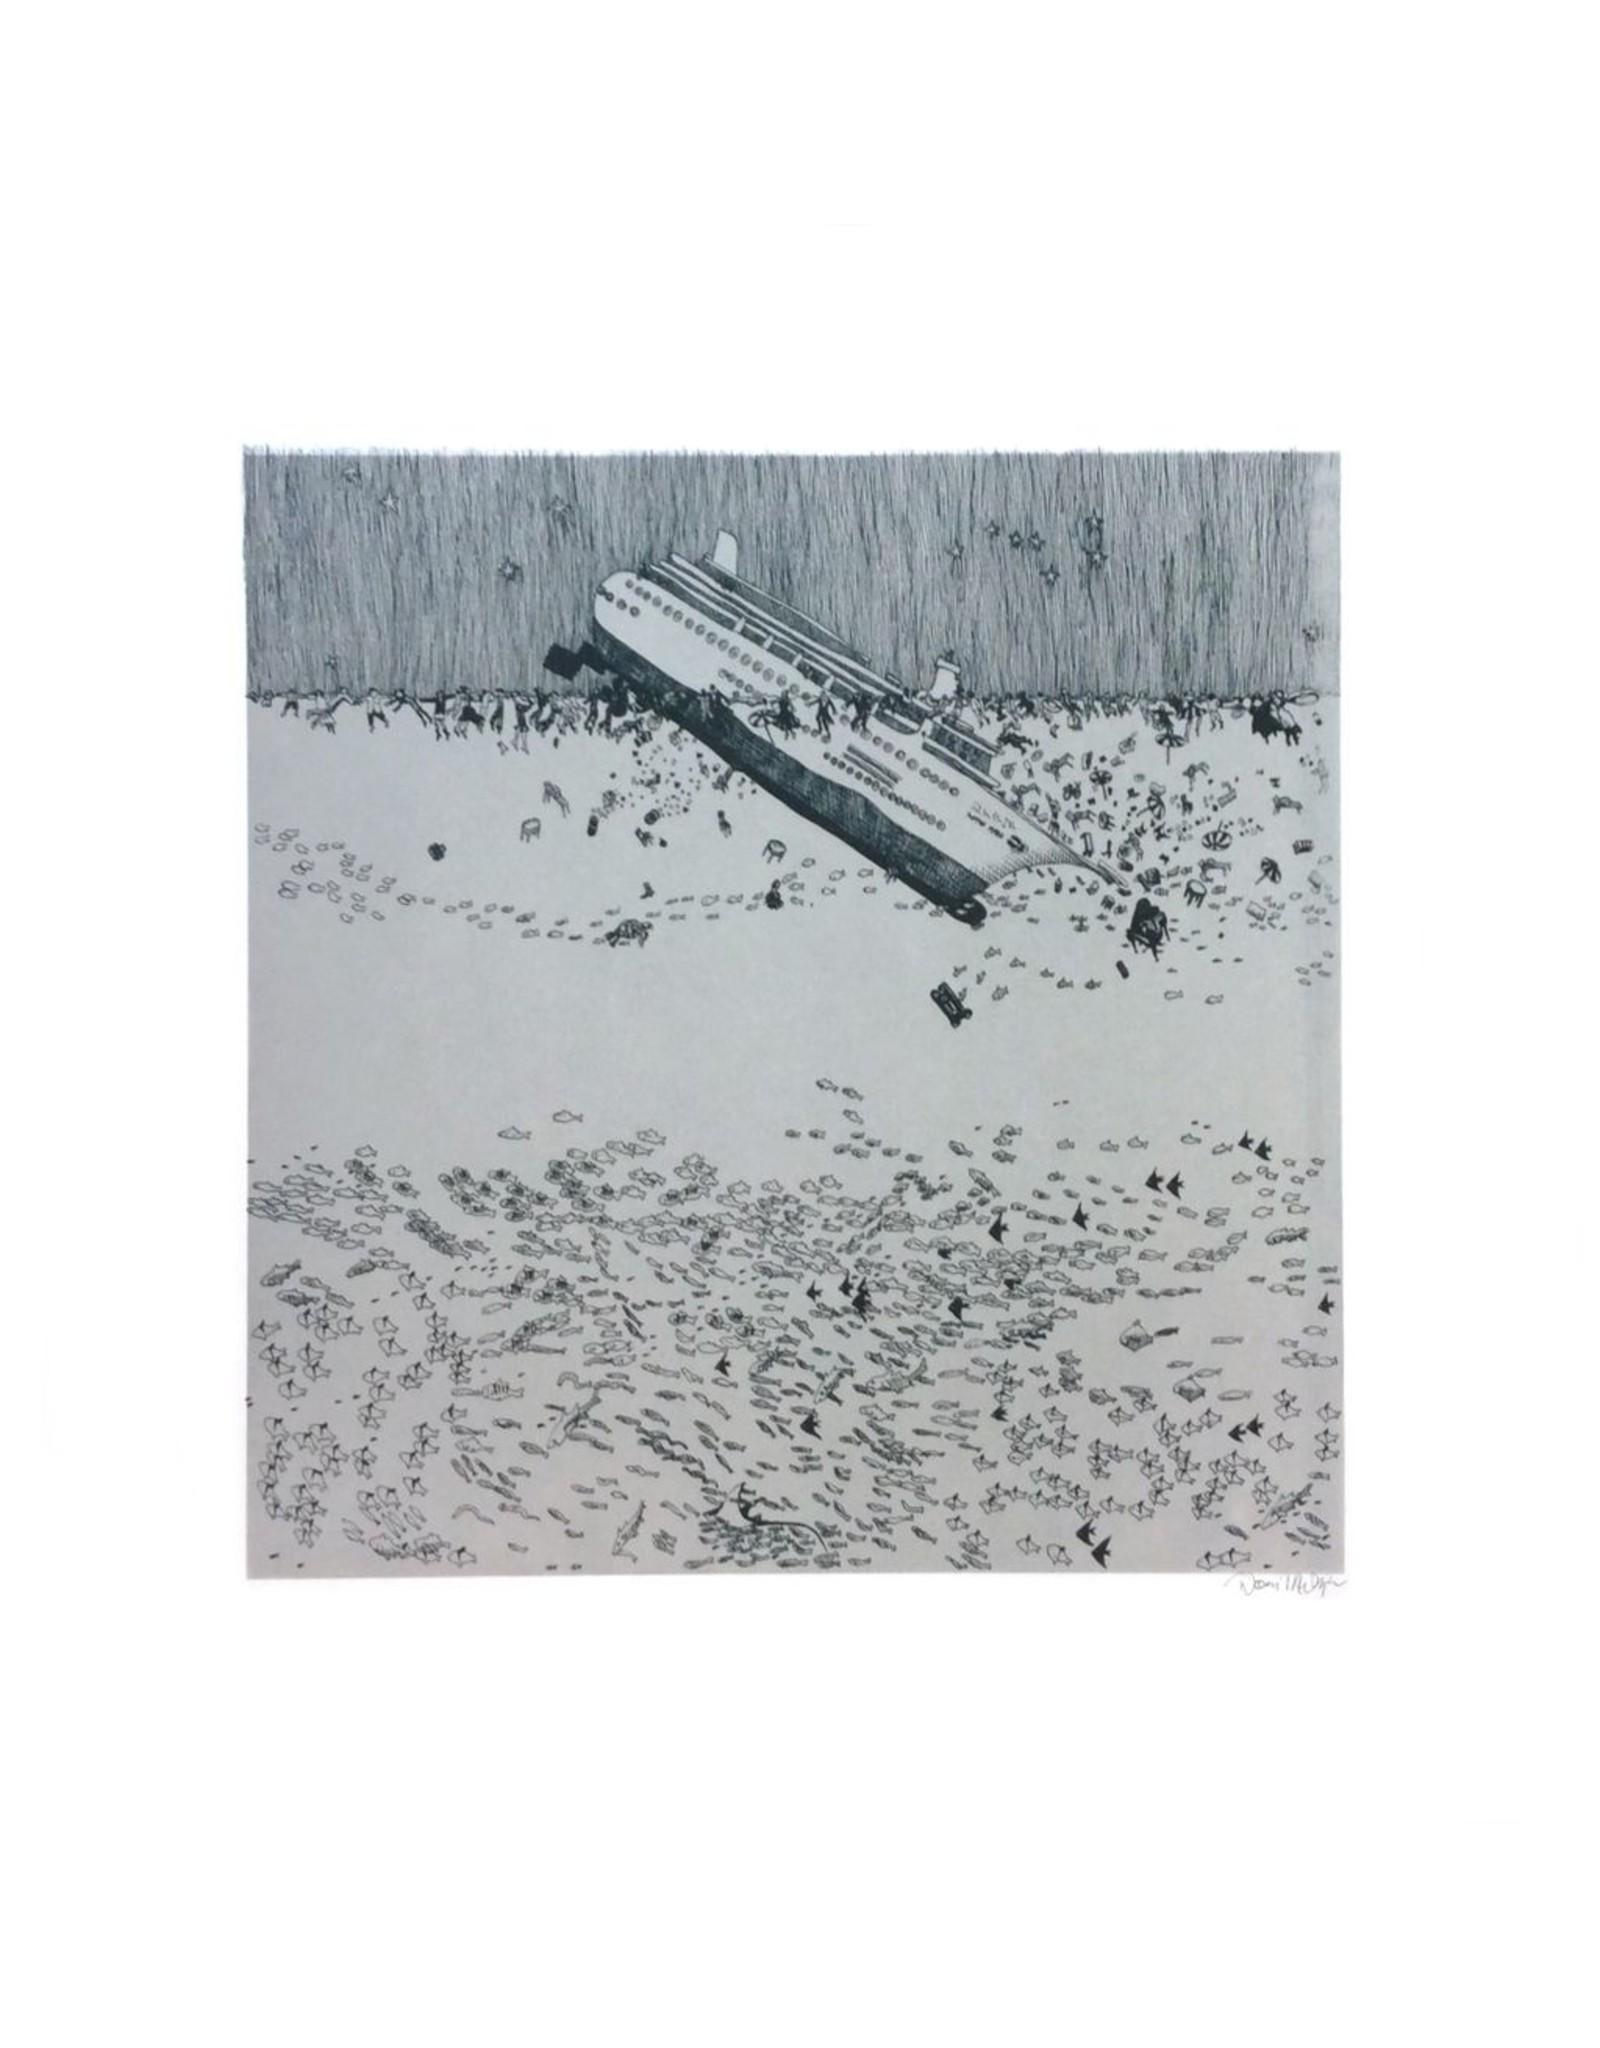 Melnyk, Doug Nippon Maru (from PaperCut folio), Doug Melnyk